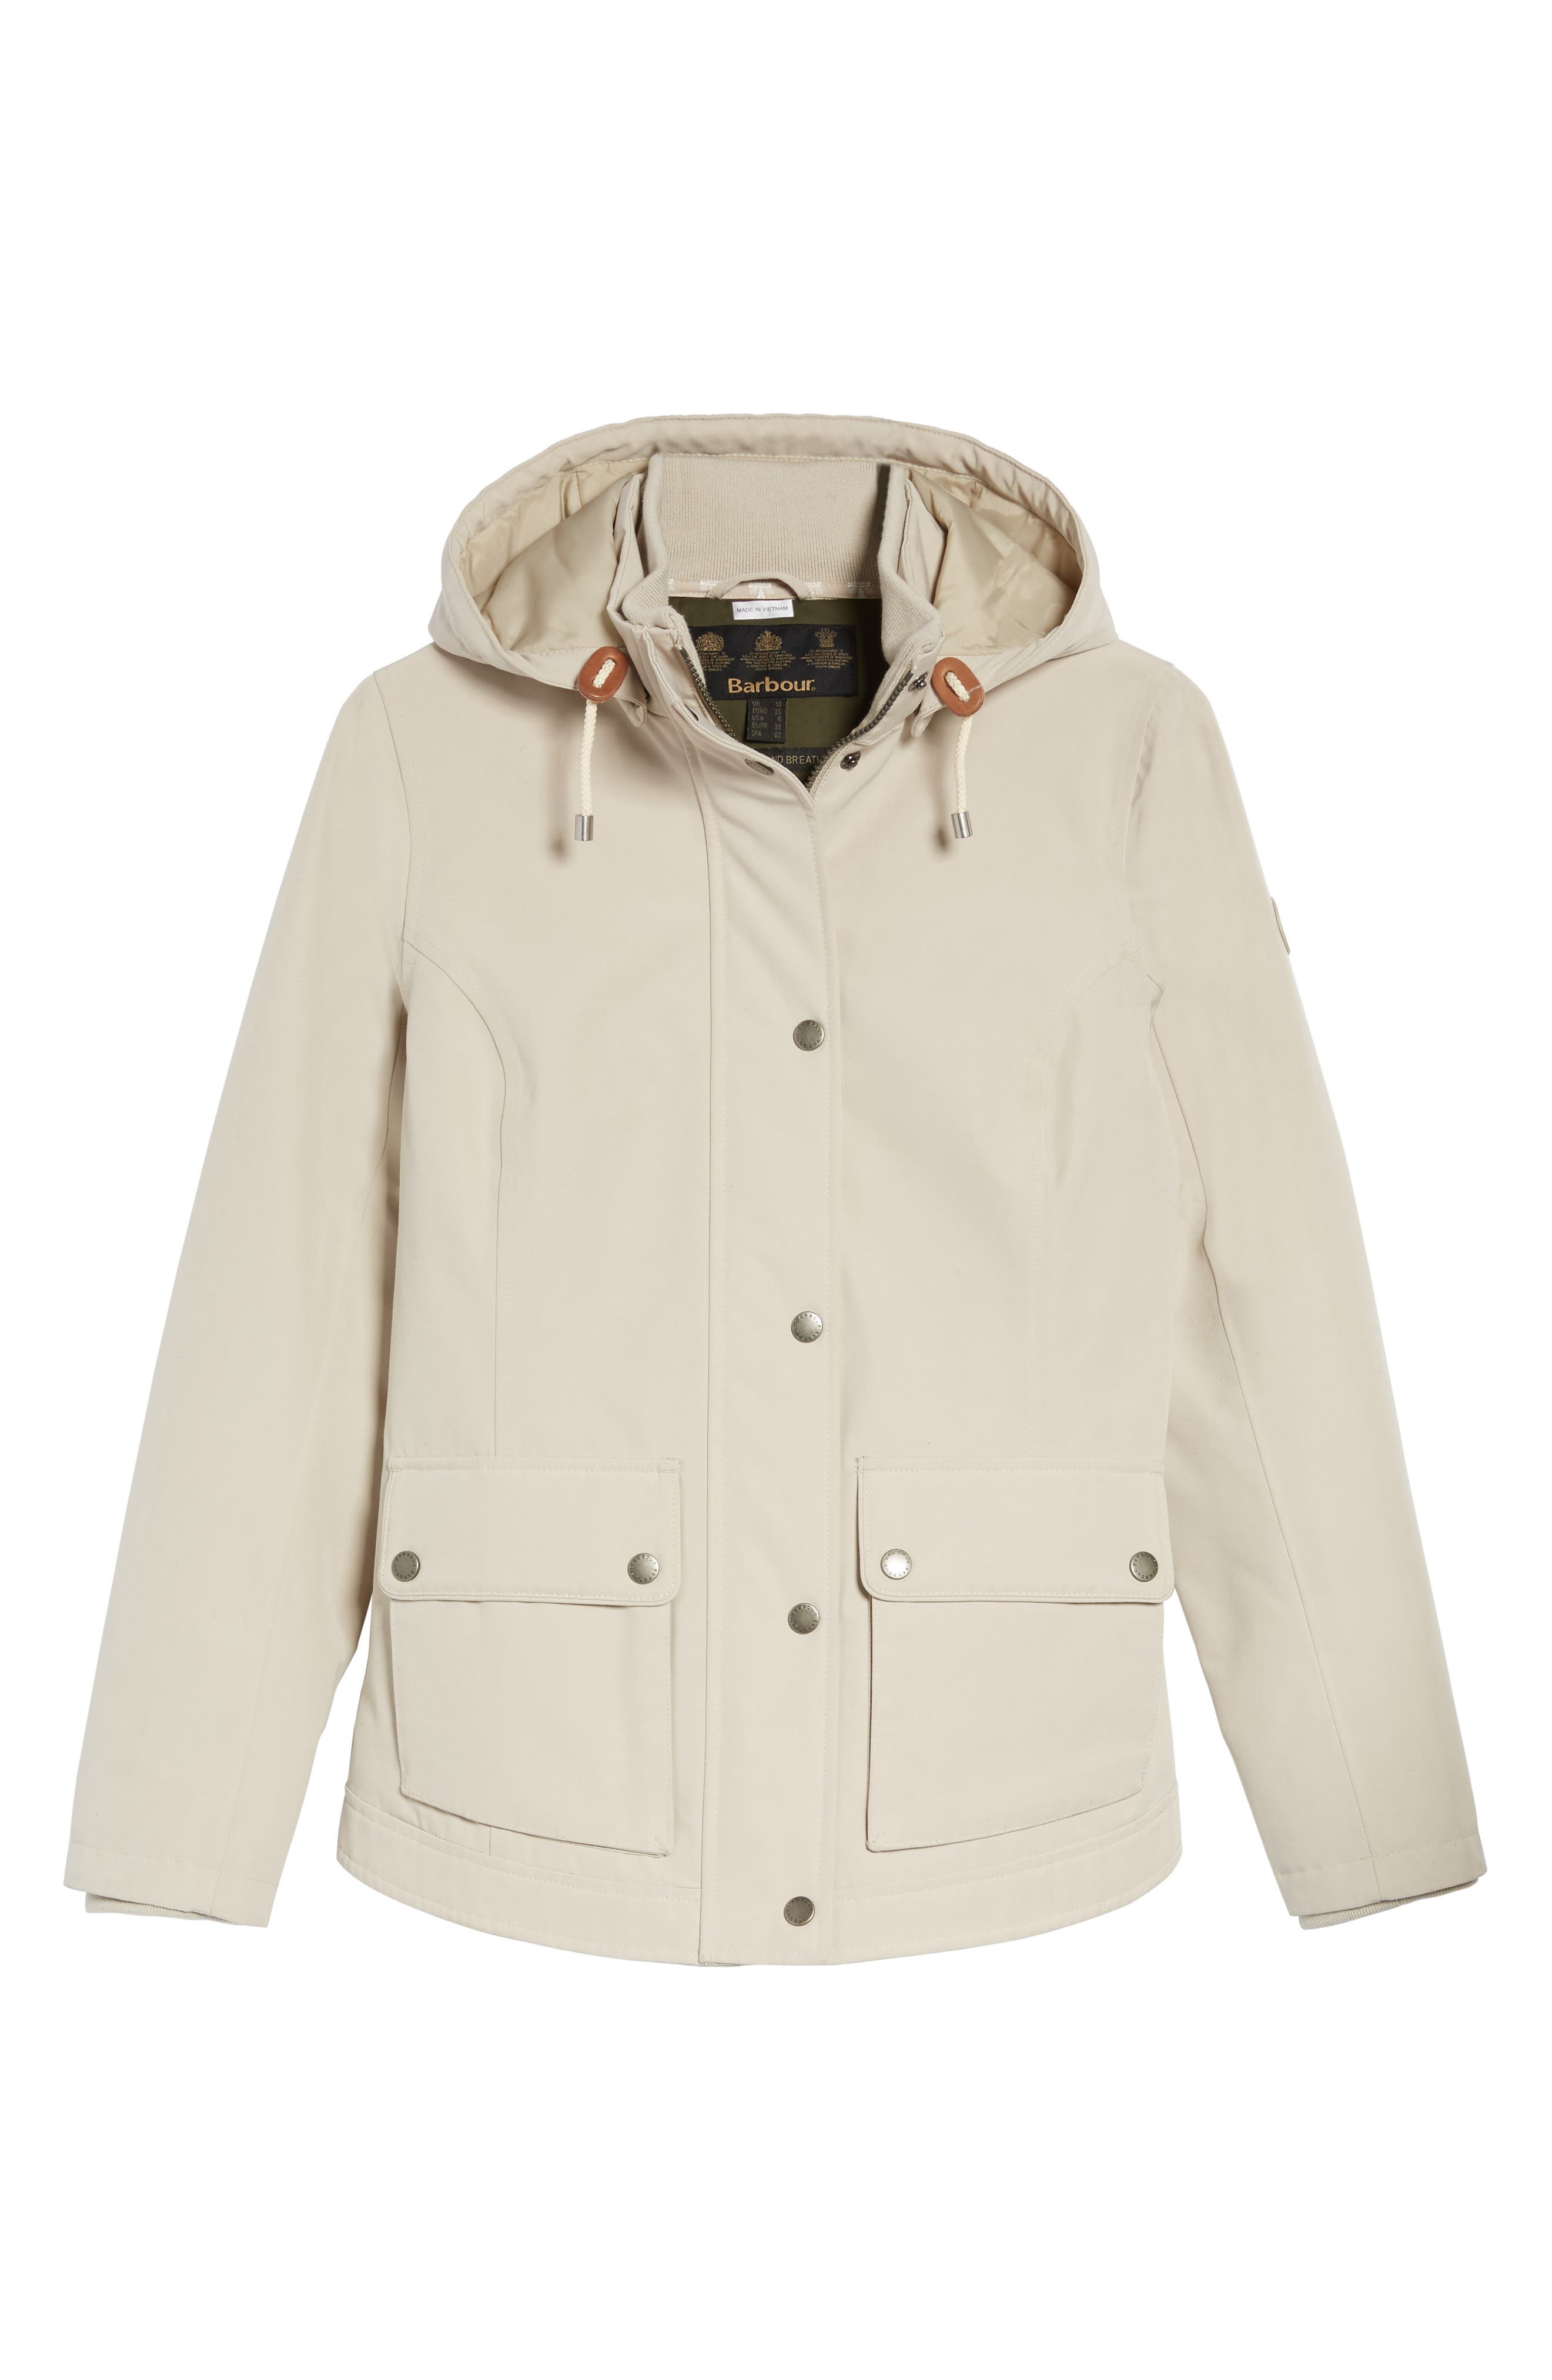 Seaton Hooded Waterproof Jacket,                             Alternate thumbnail 6, color,                             Mist